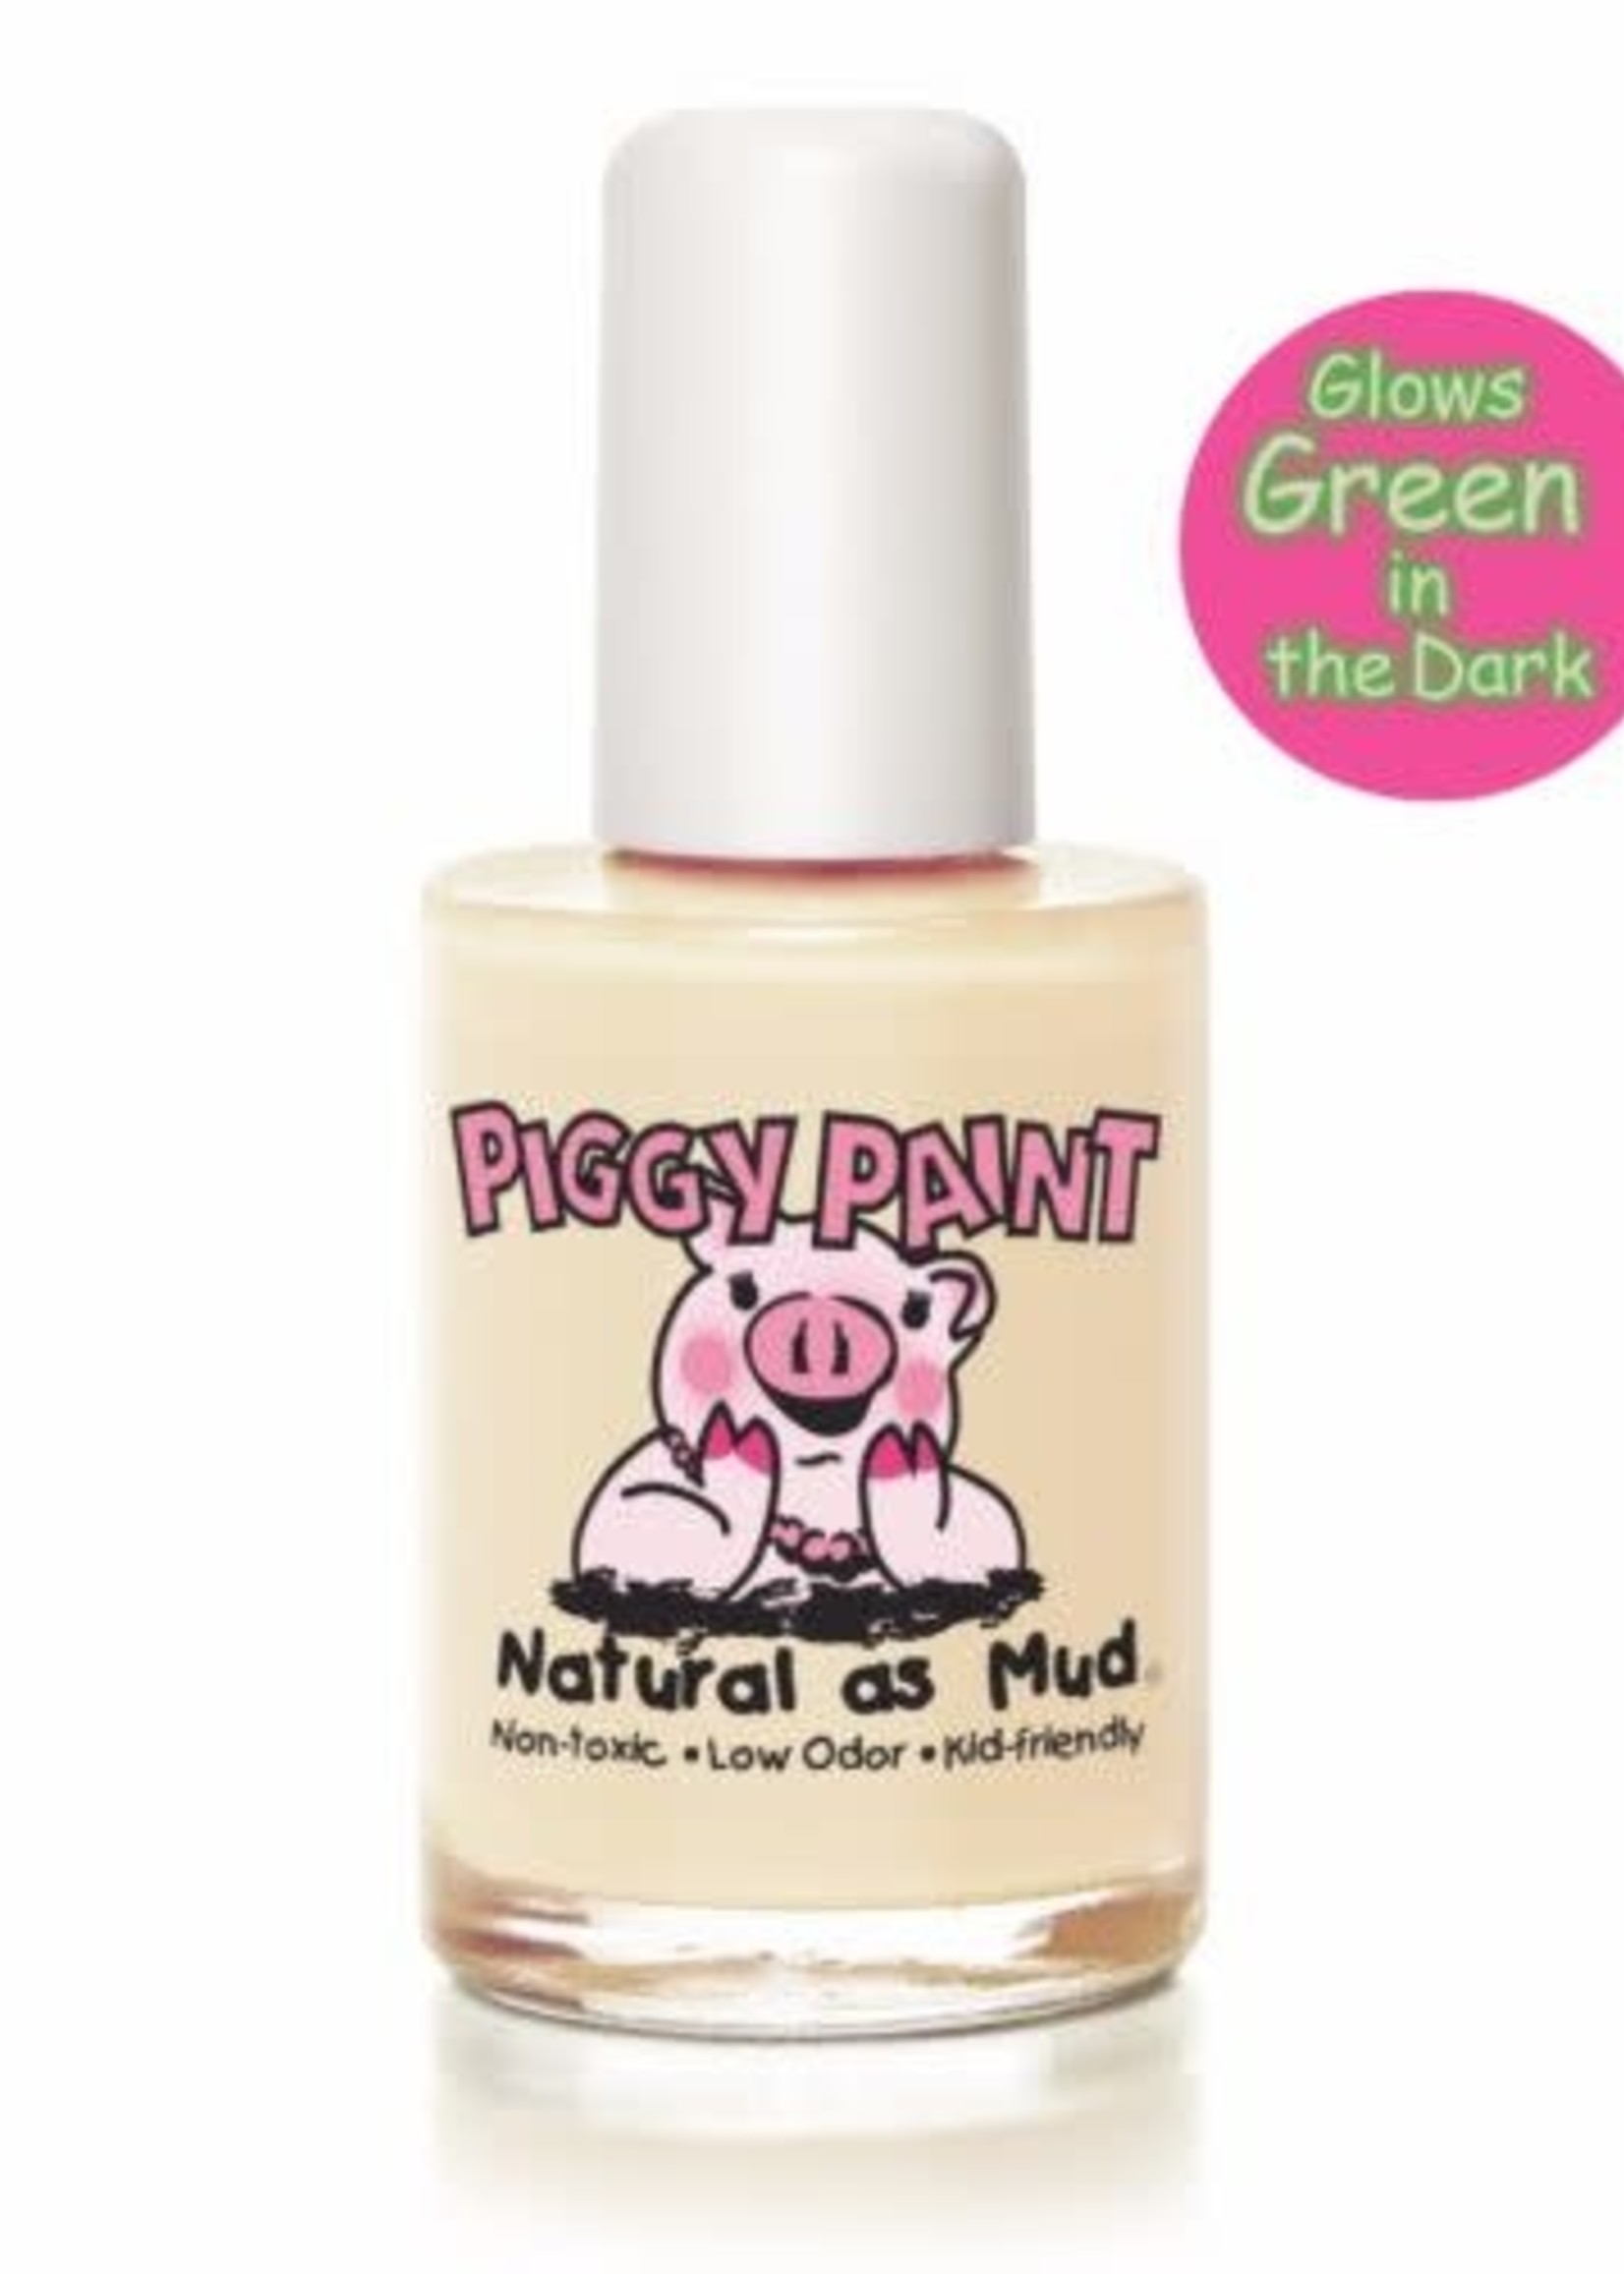 Piggy Paint Piggy Paint (Radioactive -Glow In The Dark)